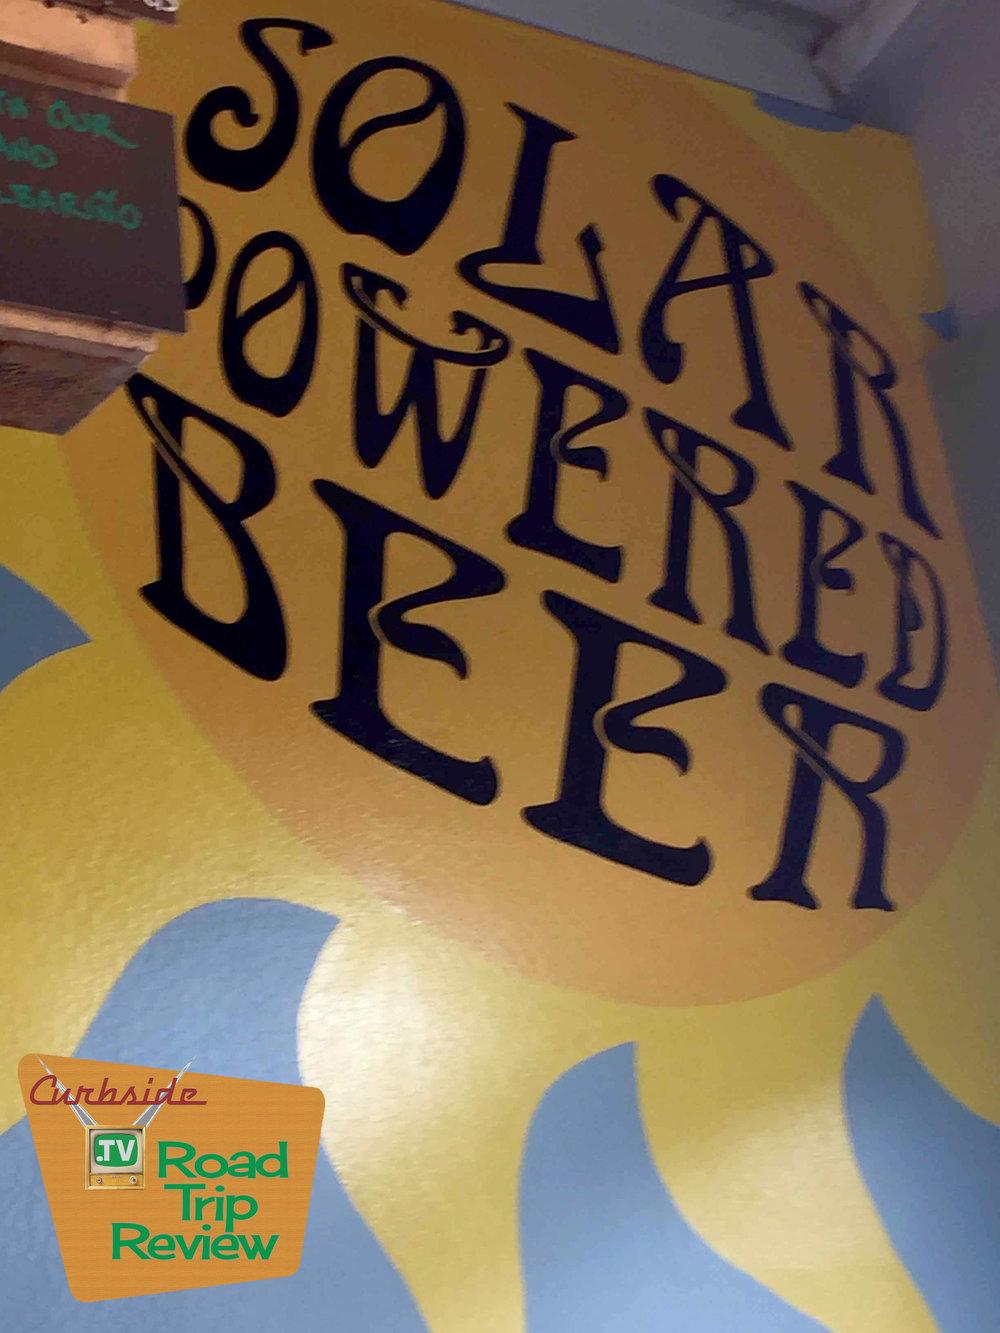 Solar-powered beer